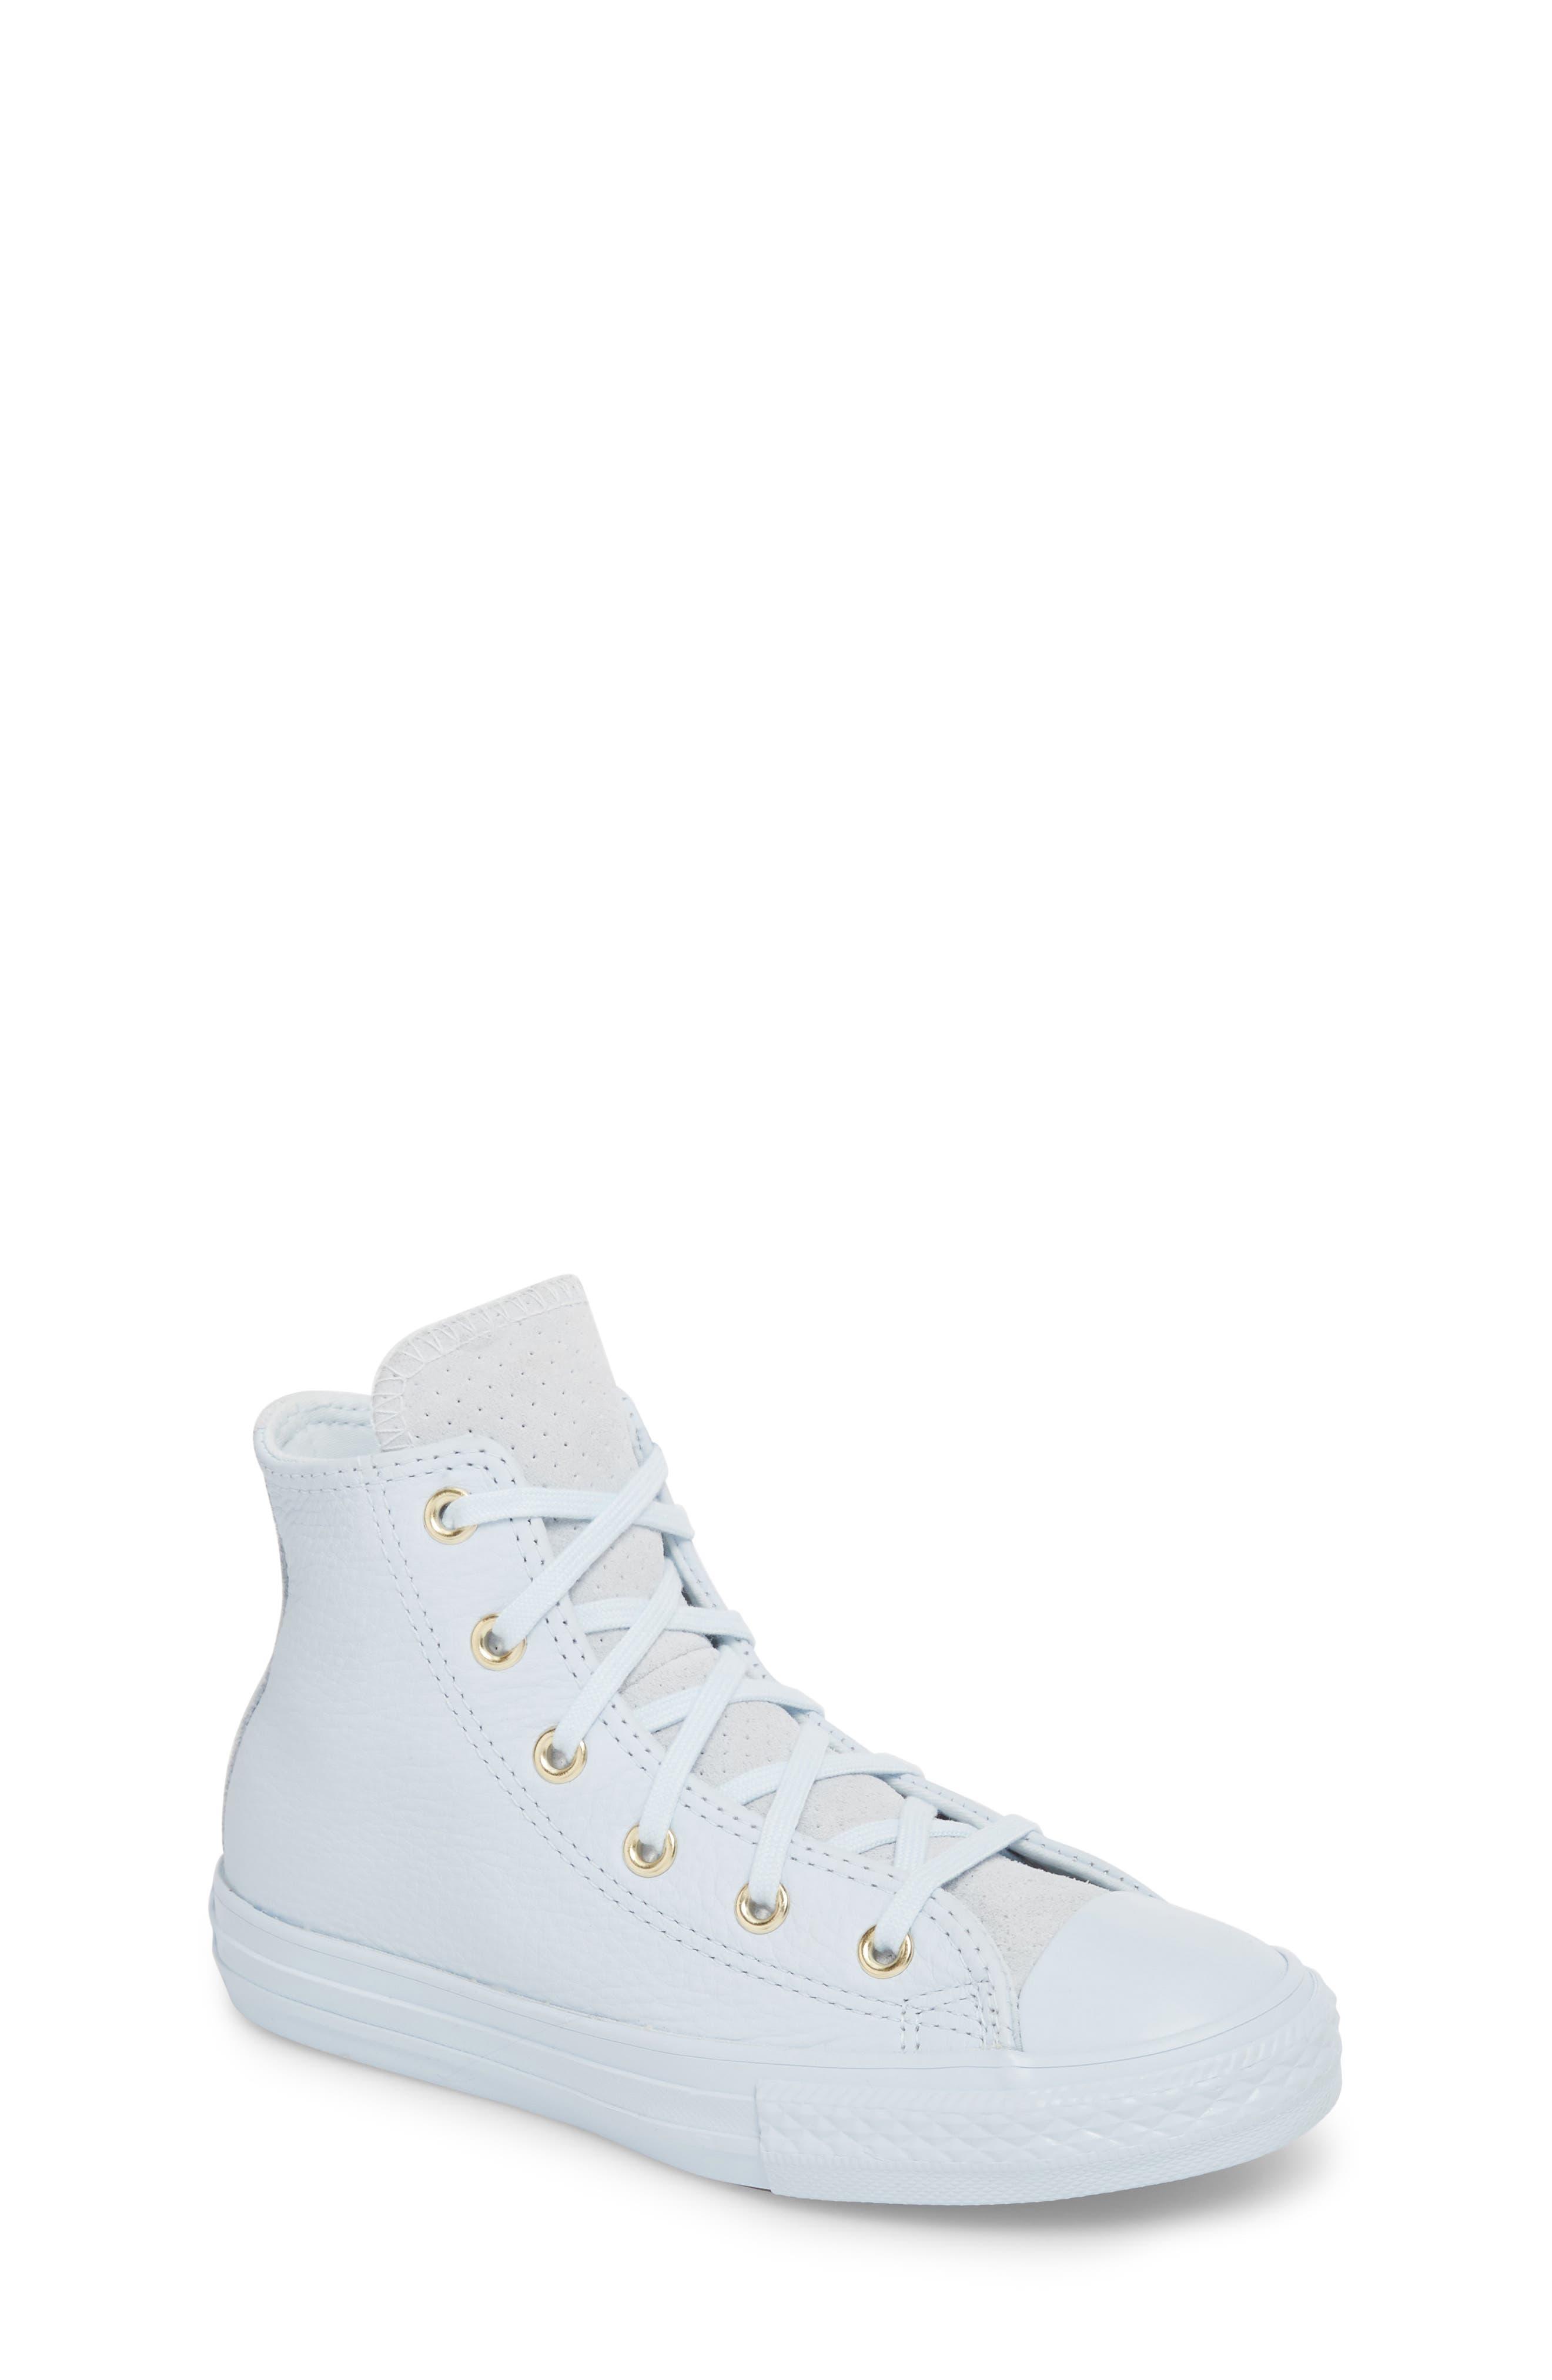 Chuck Taylor<sup>®</sup> All Star<sup>®</sup> Mono High Top Sneaker,                             Main thumbnail 1, color,                             454